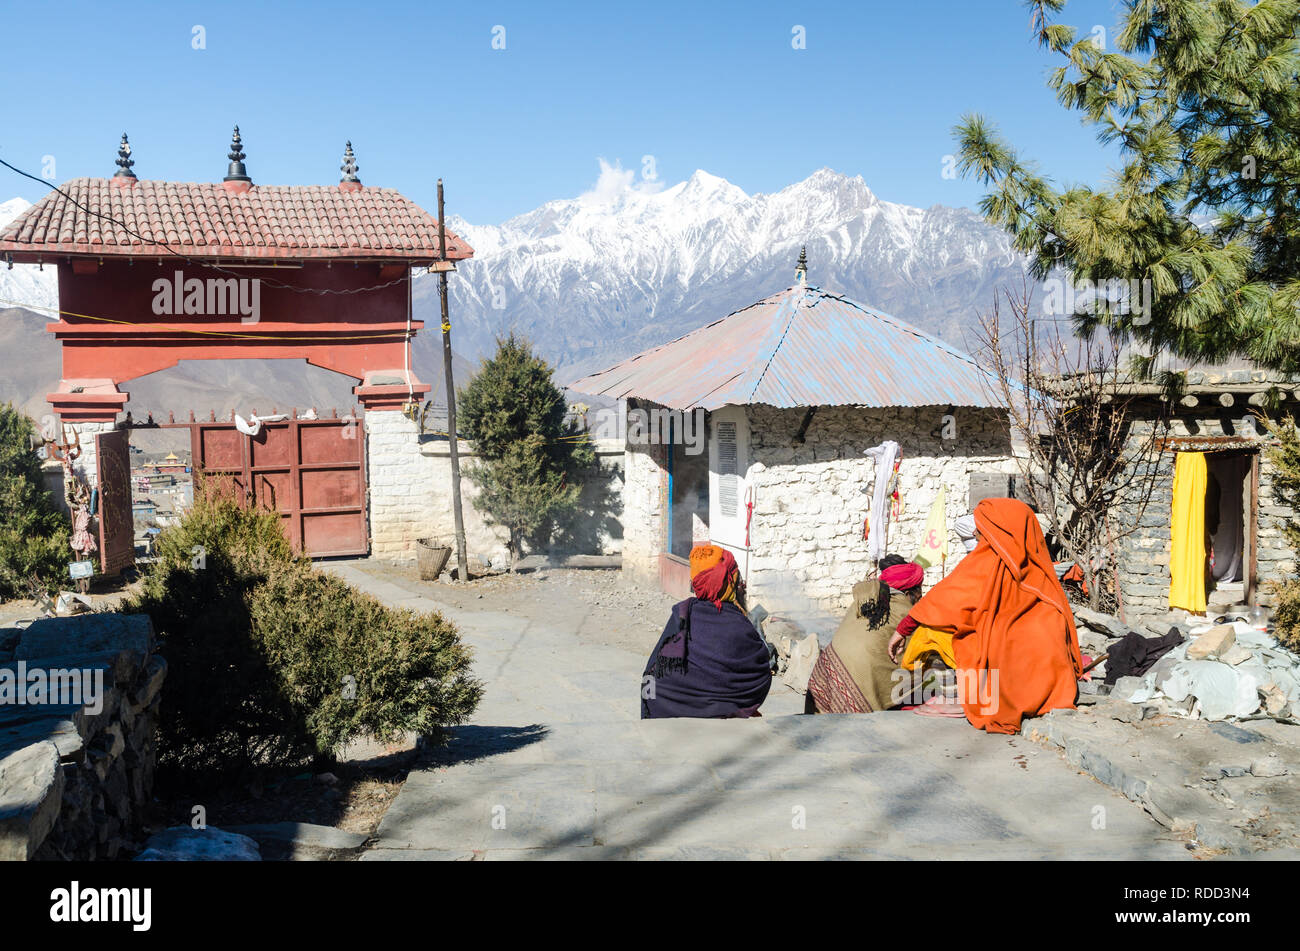 Sadhus in Muktinath temple, Annapurna Circuit, Nepal - Stock Image